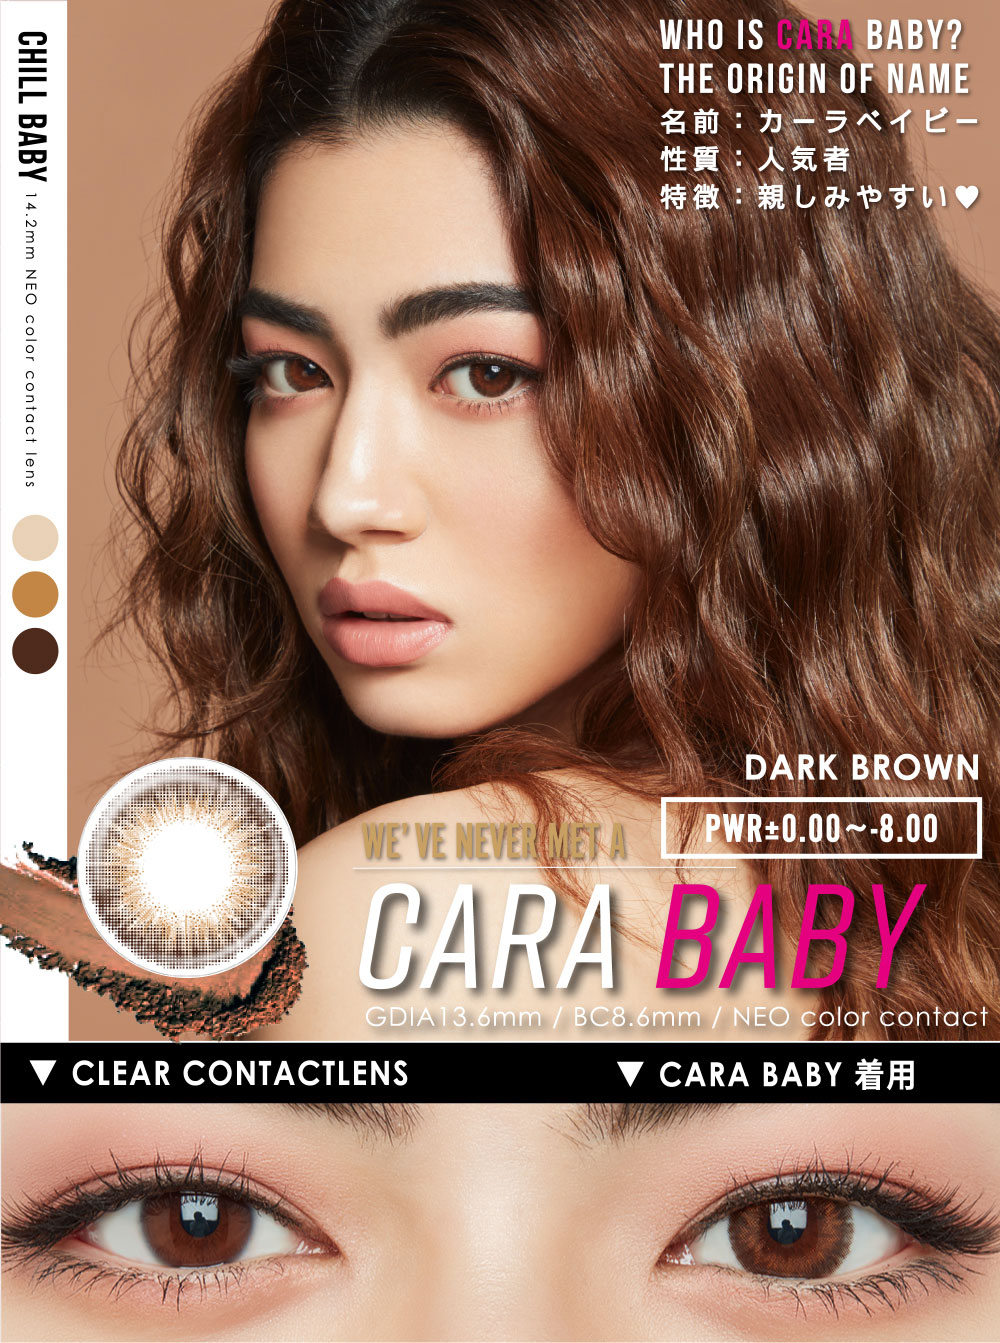 CARA BABY(カラー)